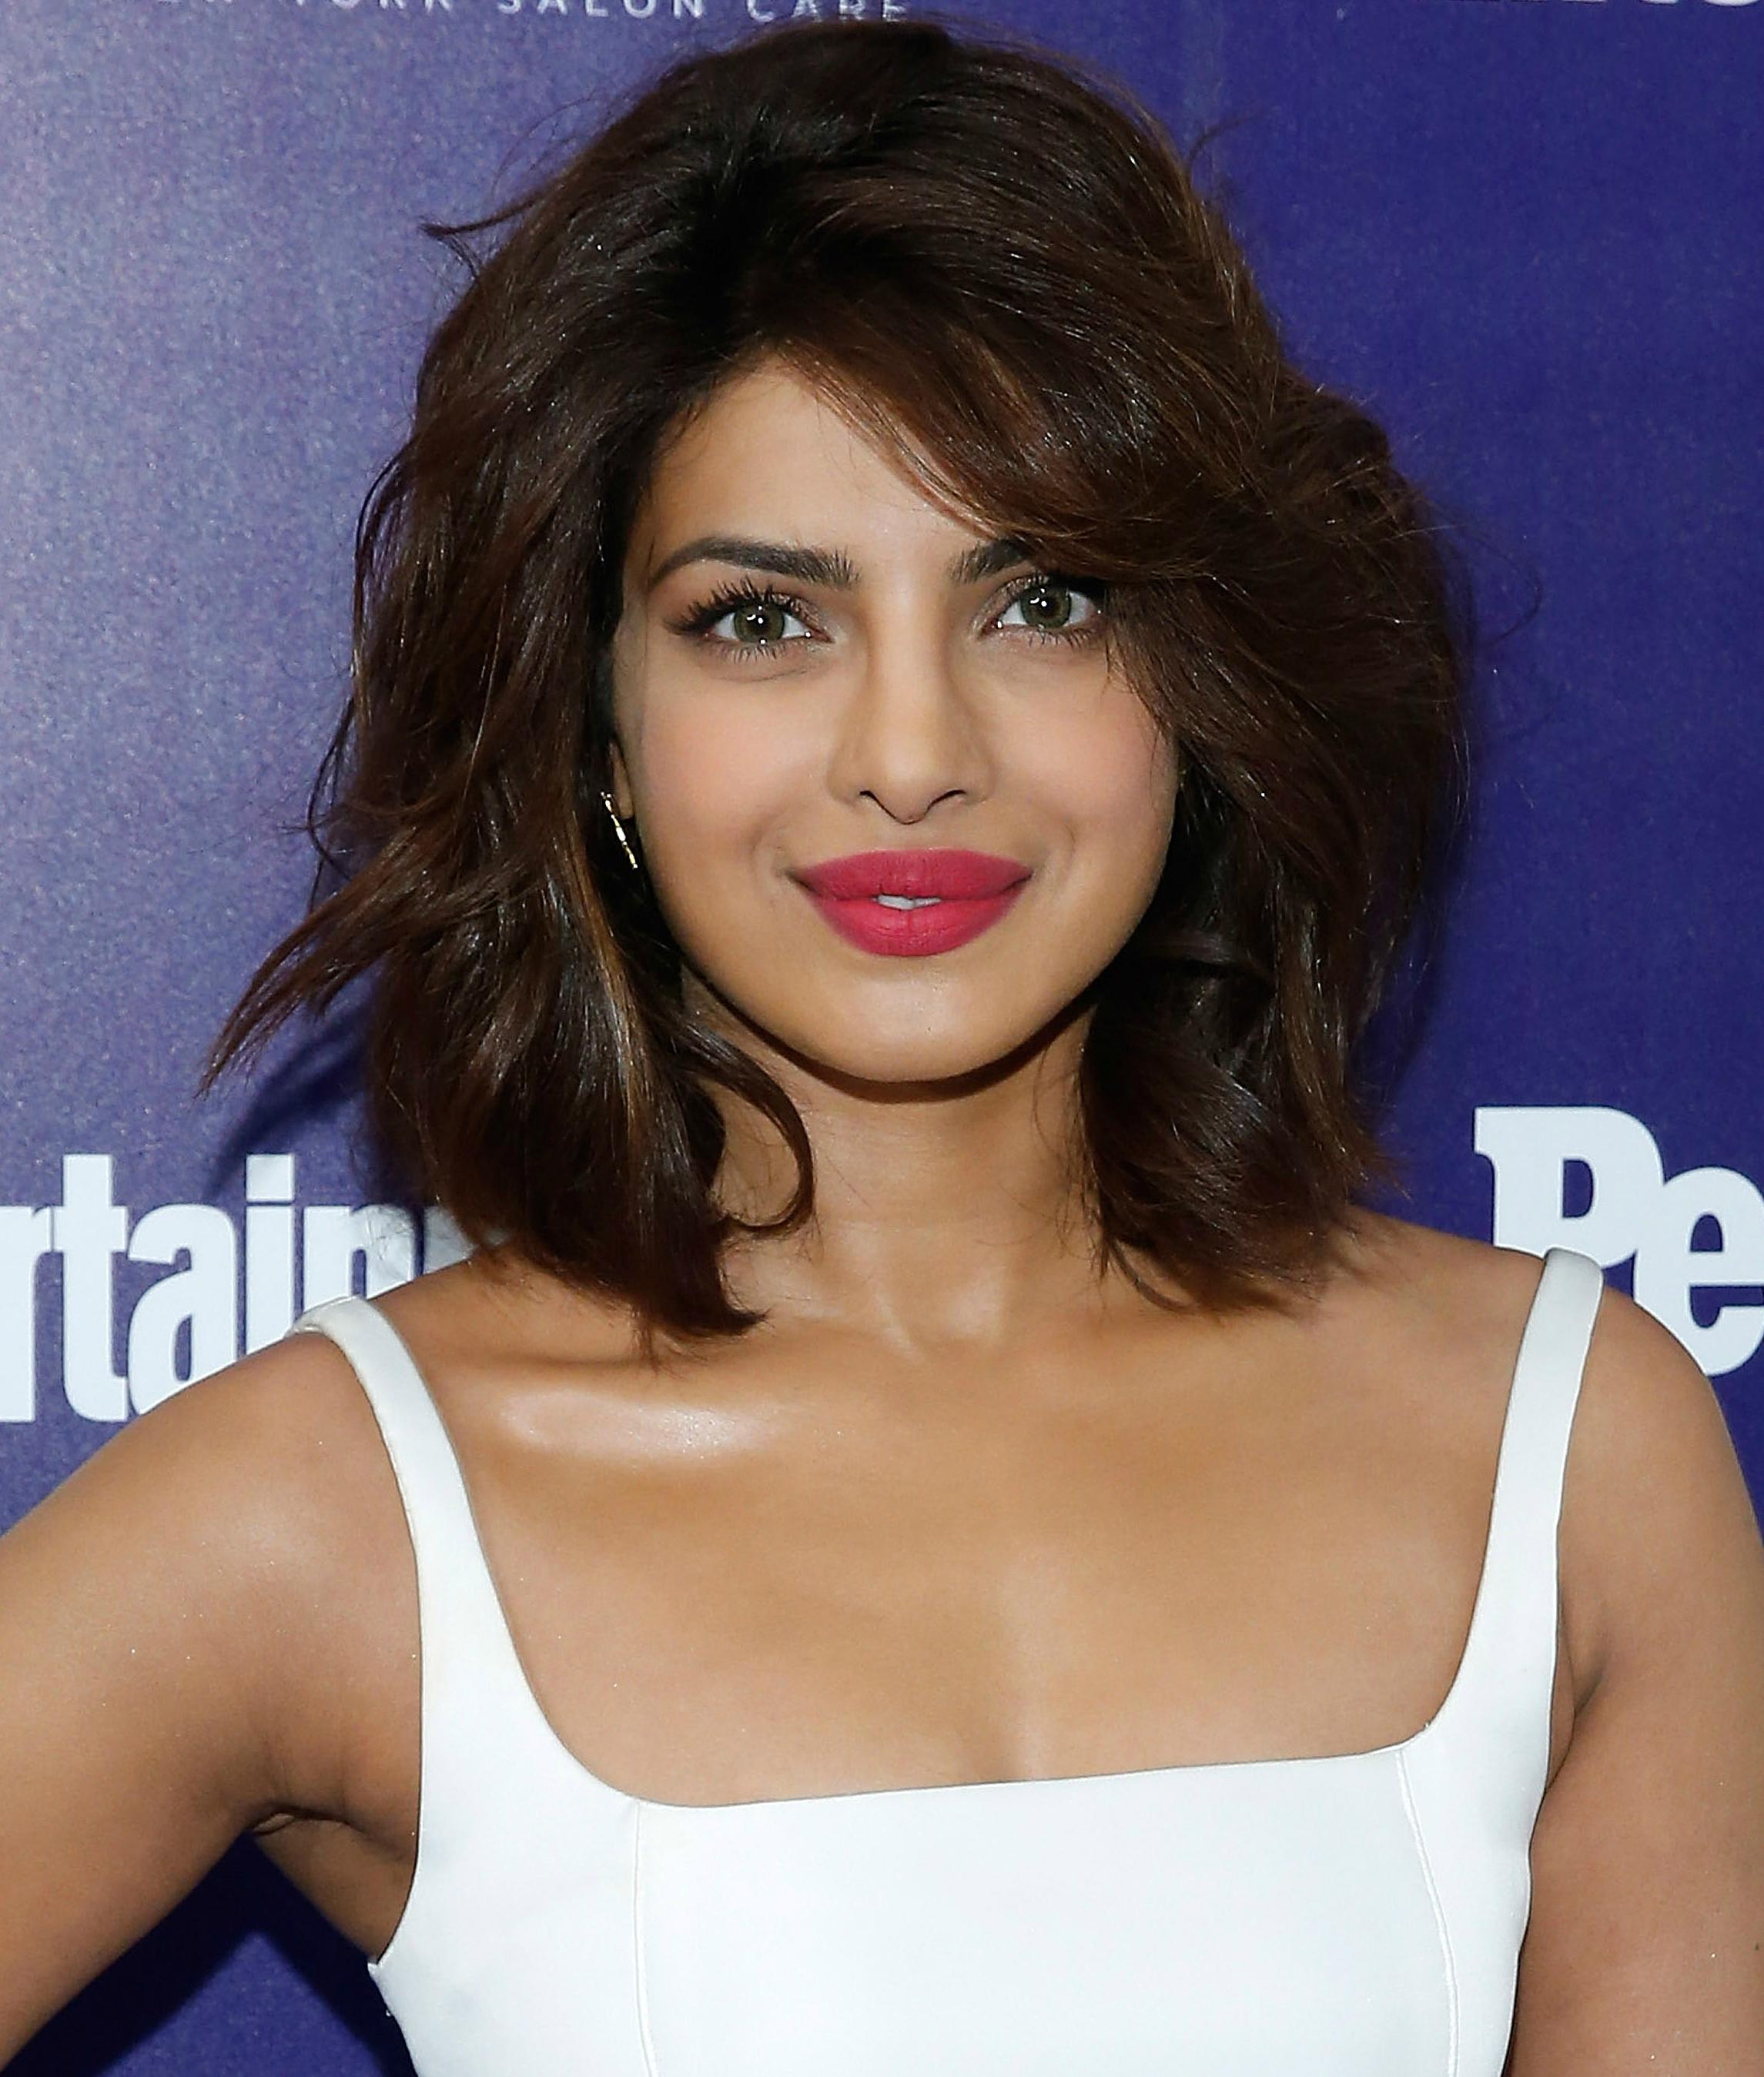 Priyanka Chopra Recent Hairstyle - Deepika Padukone Age